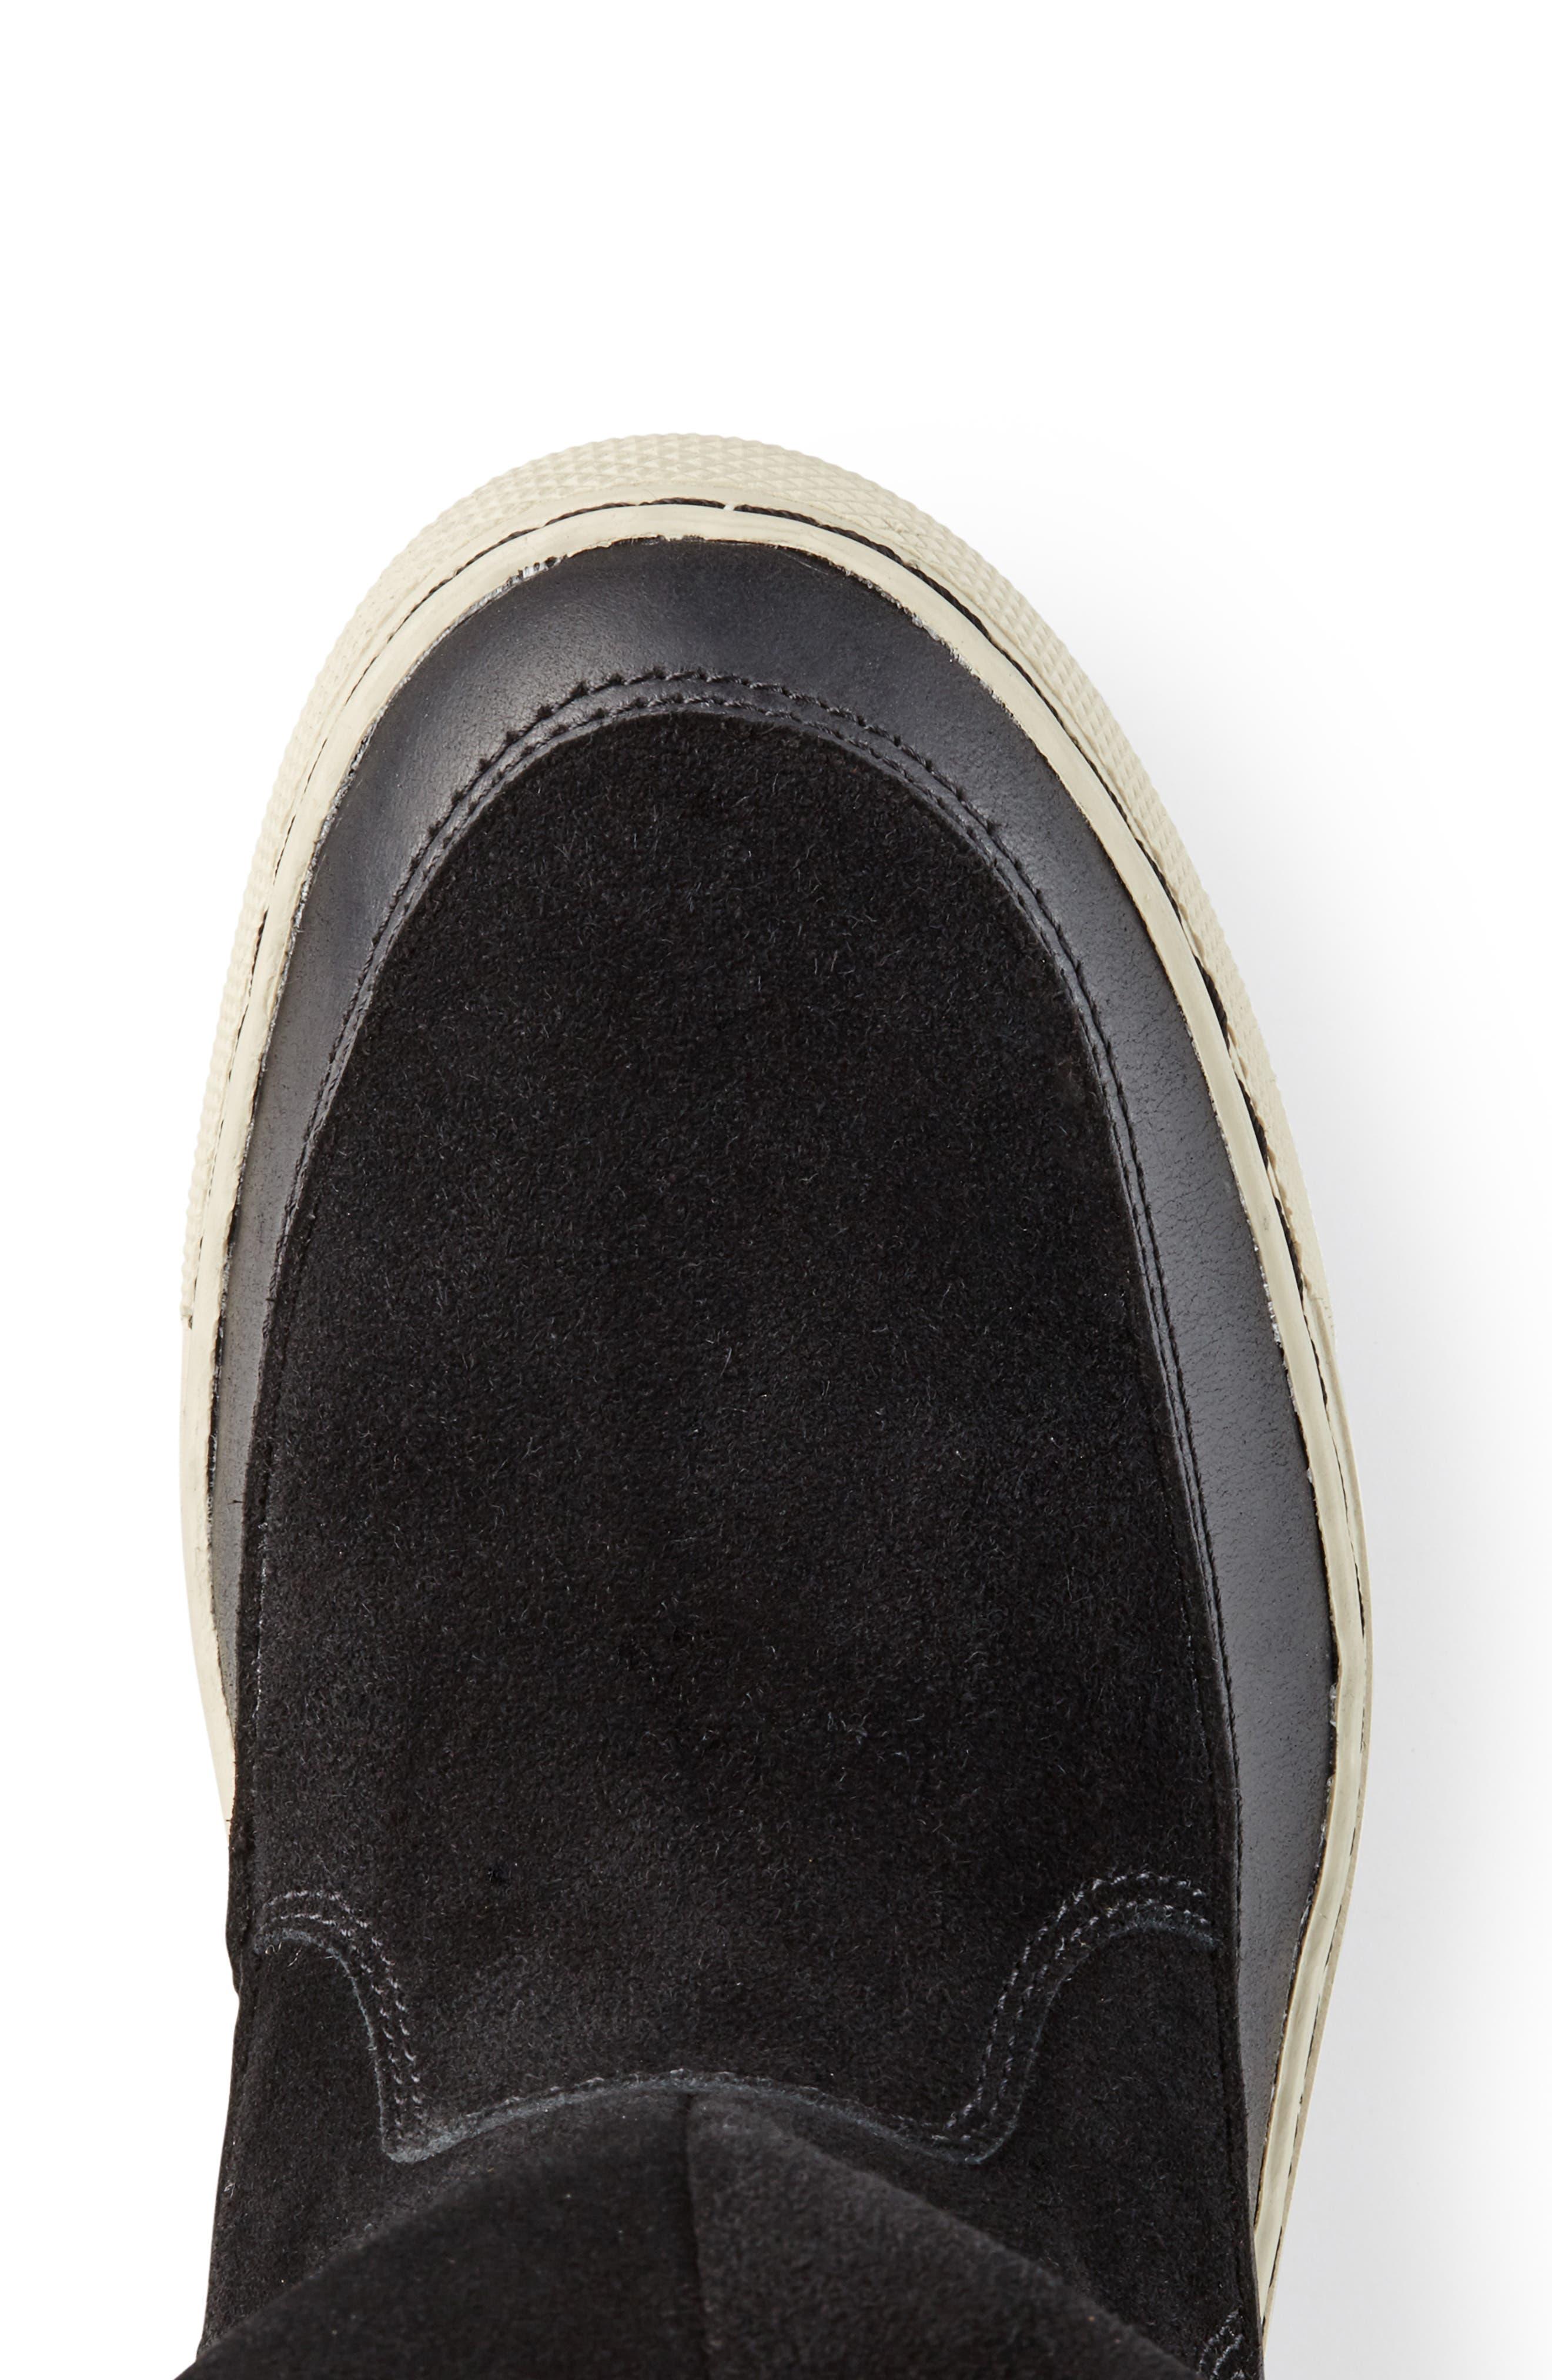 Dresden Waterproof Sneaker Boot with Faux Fur Trim,                             Alternate thumbnail 5, color,                             001